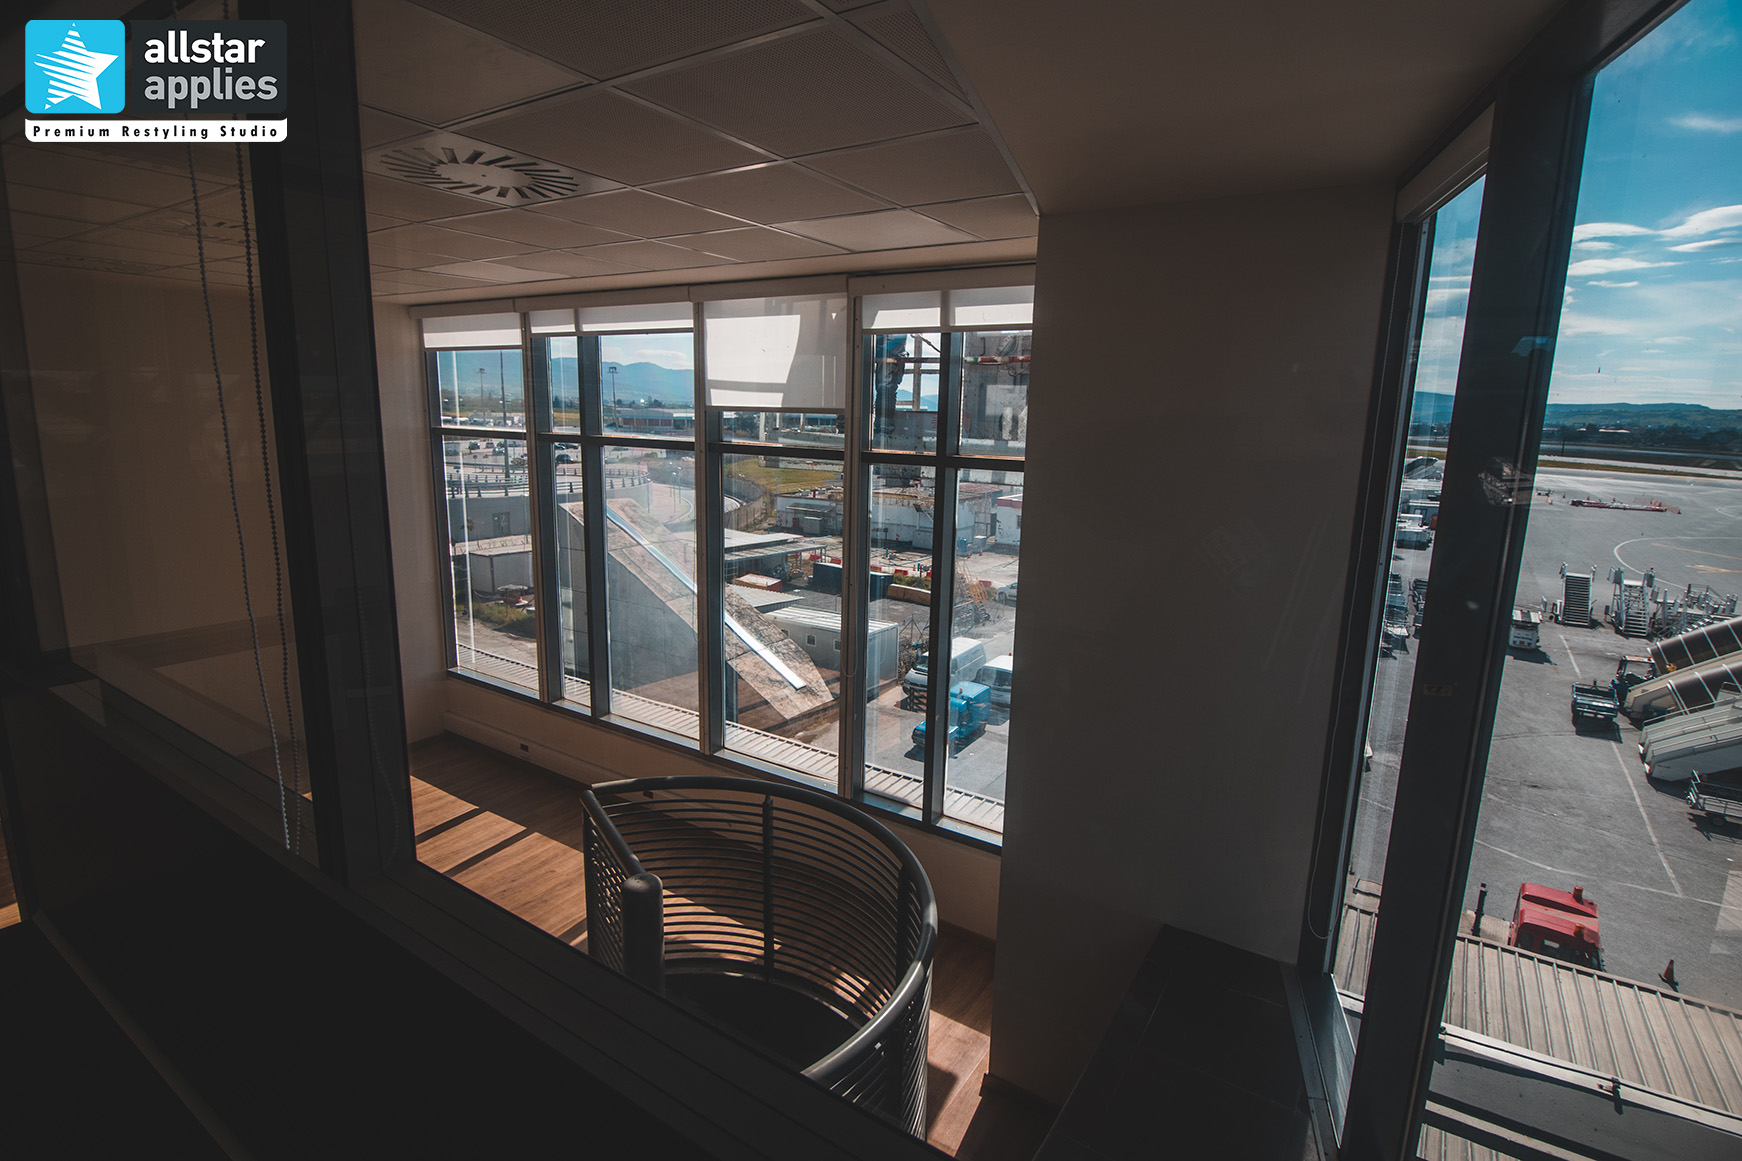 skg airport office 5